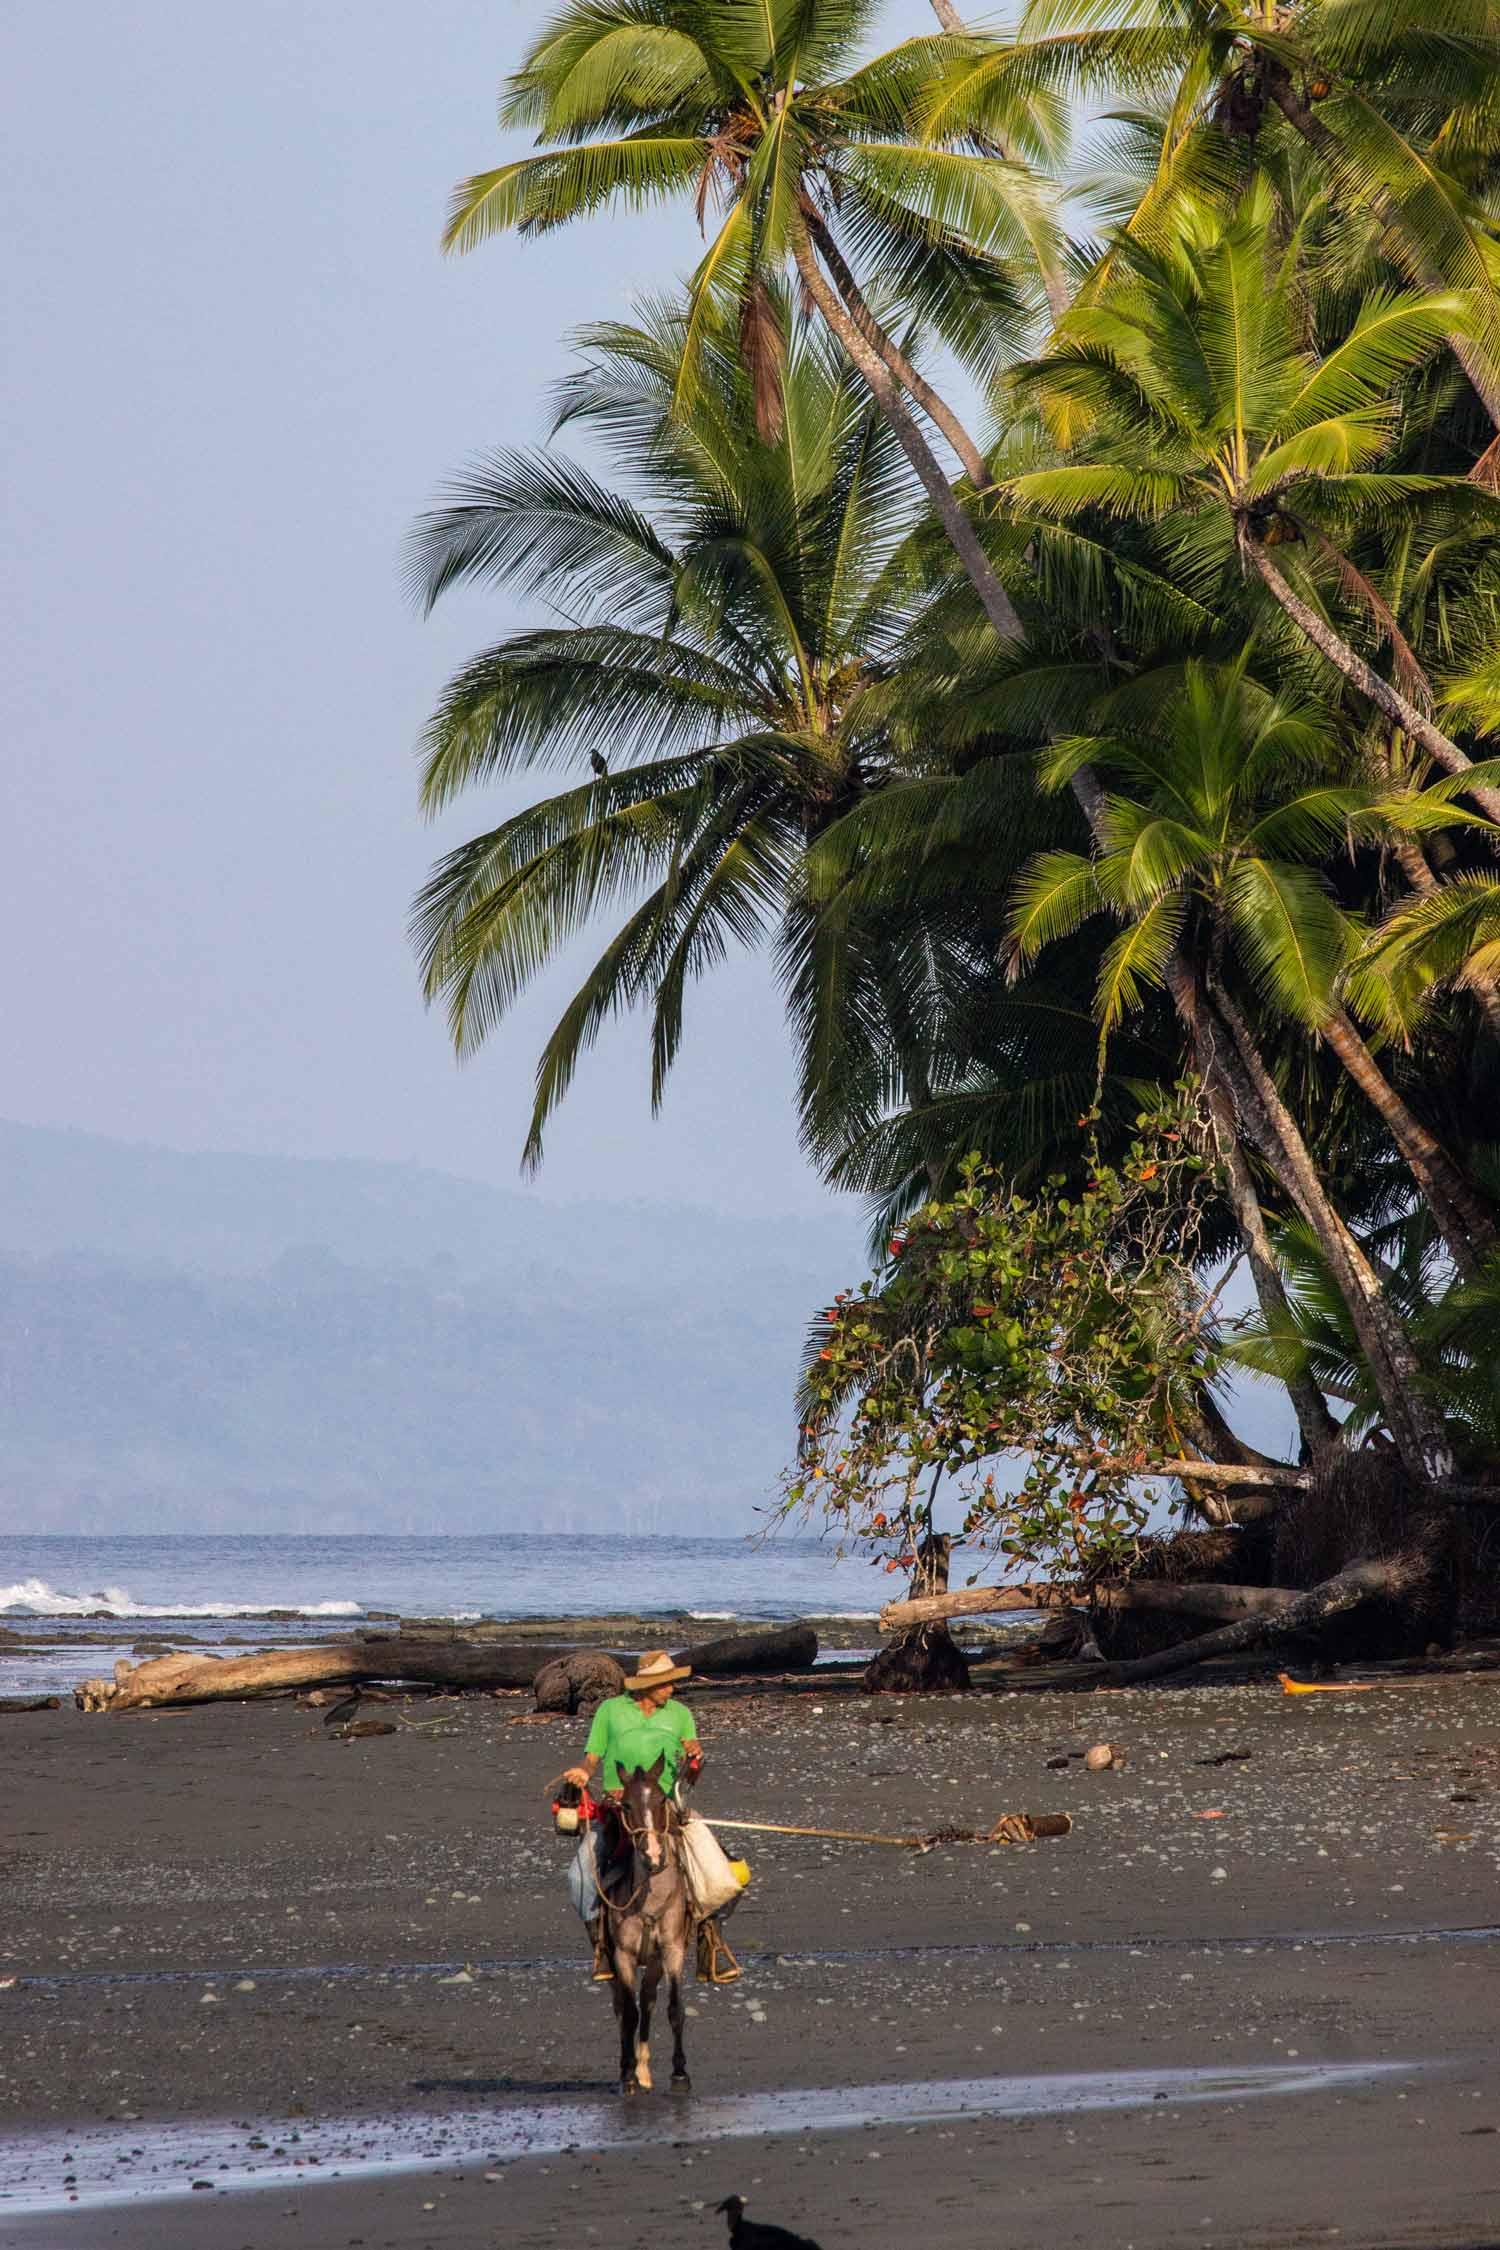 Local man horseback riding on the beach of Punta Banco Costa Rica